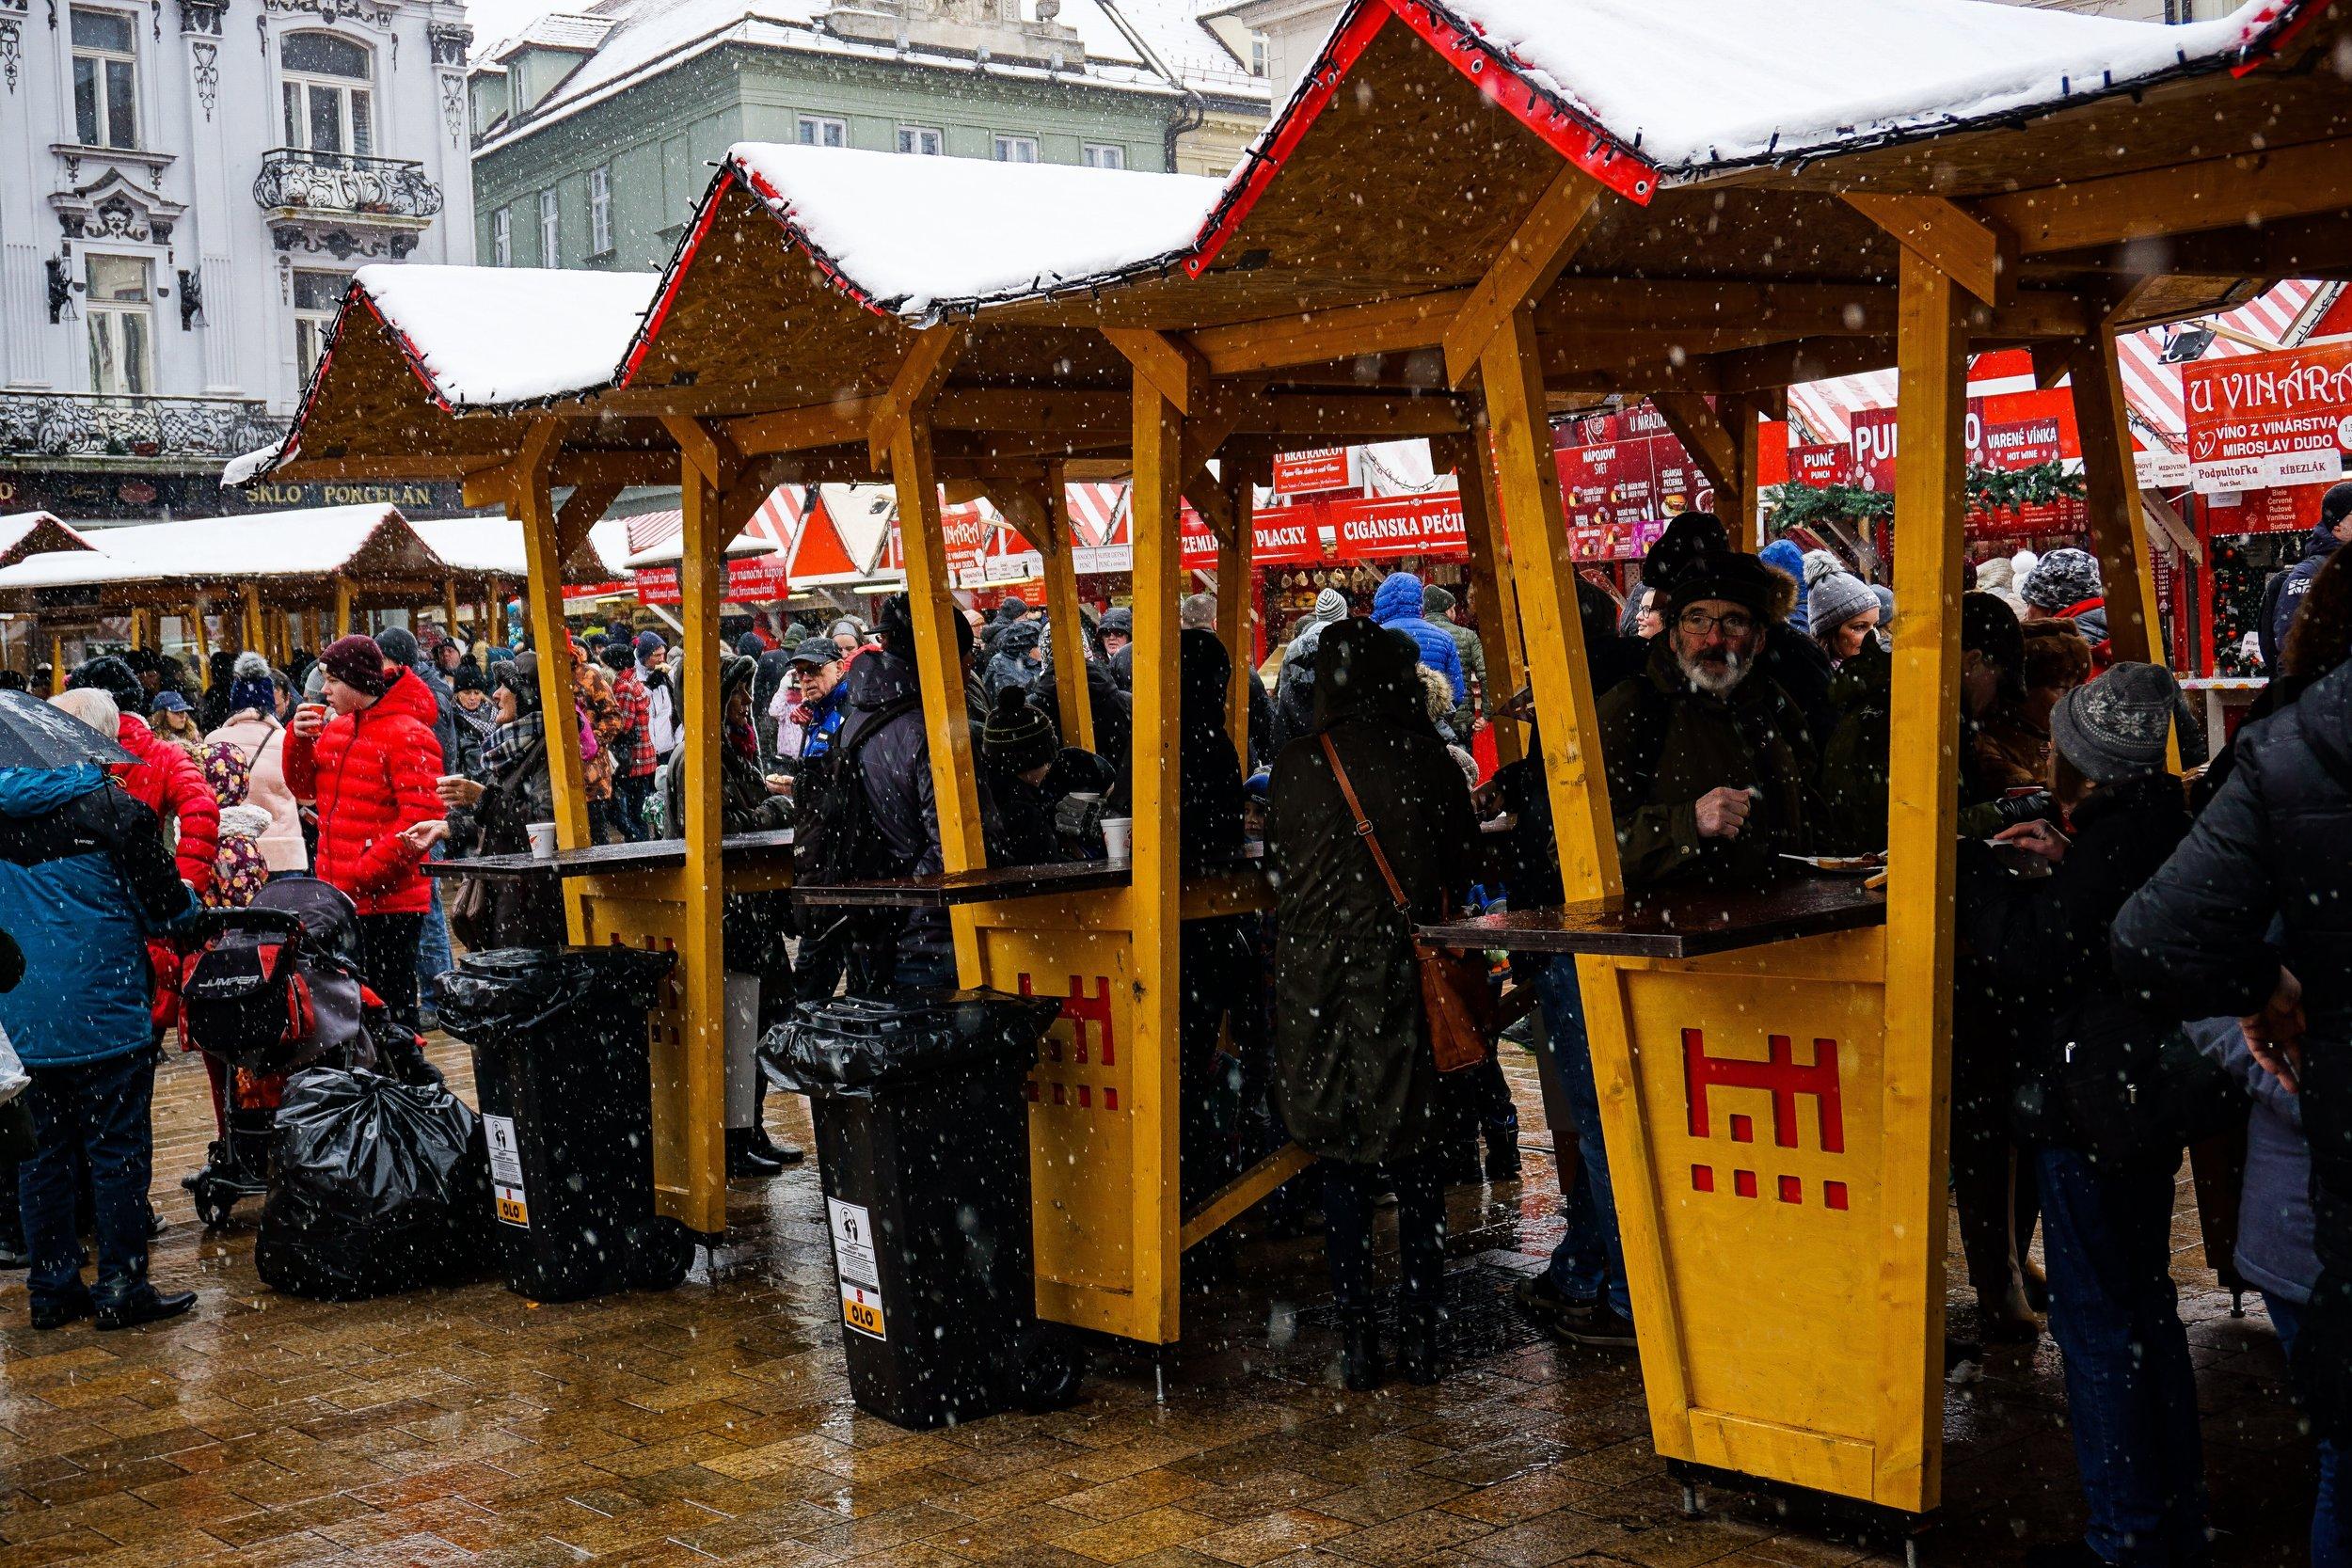 bratislava_christmast markets_market6.jpeg